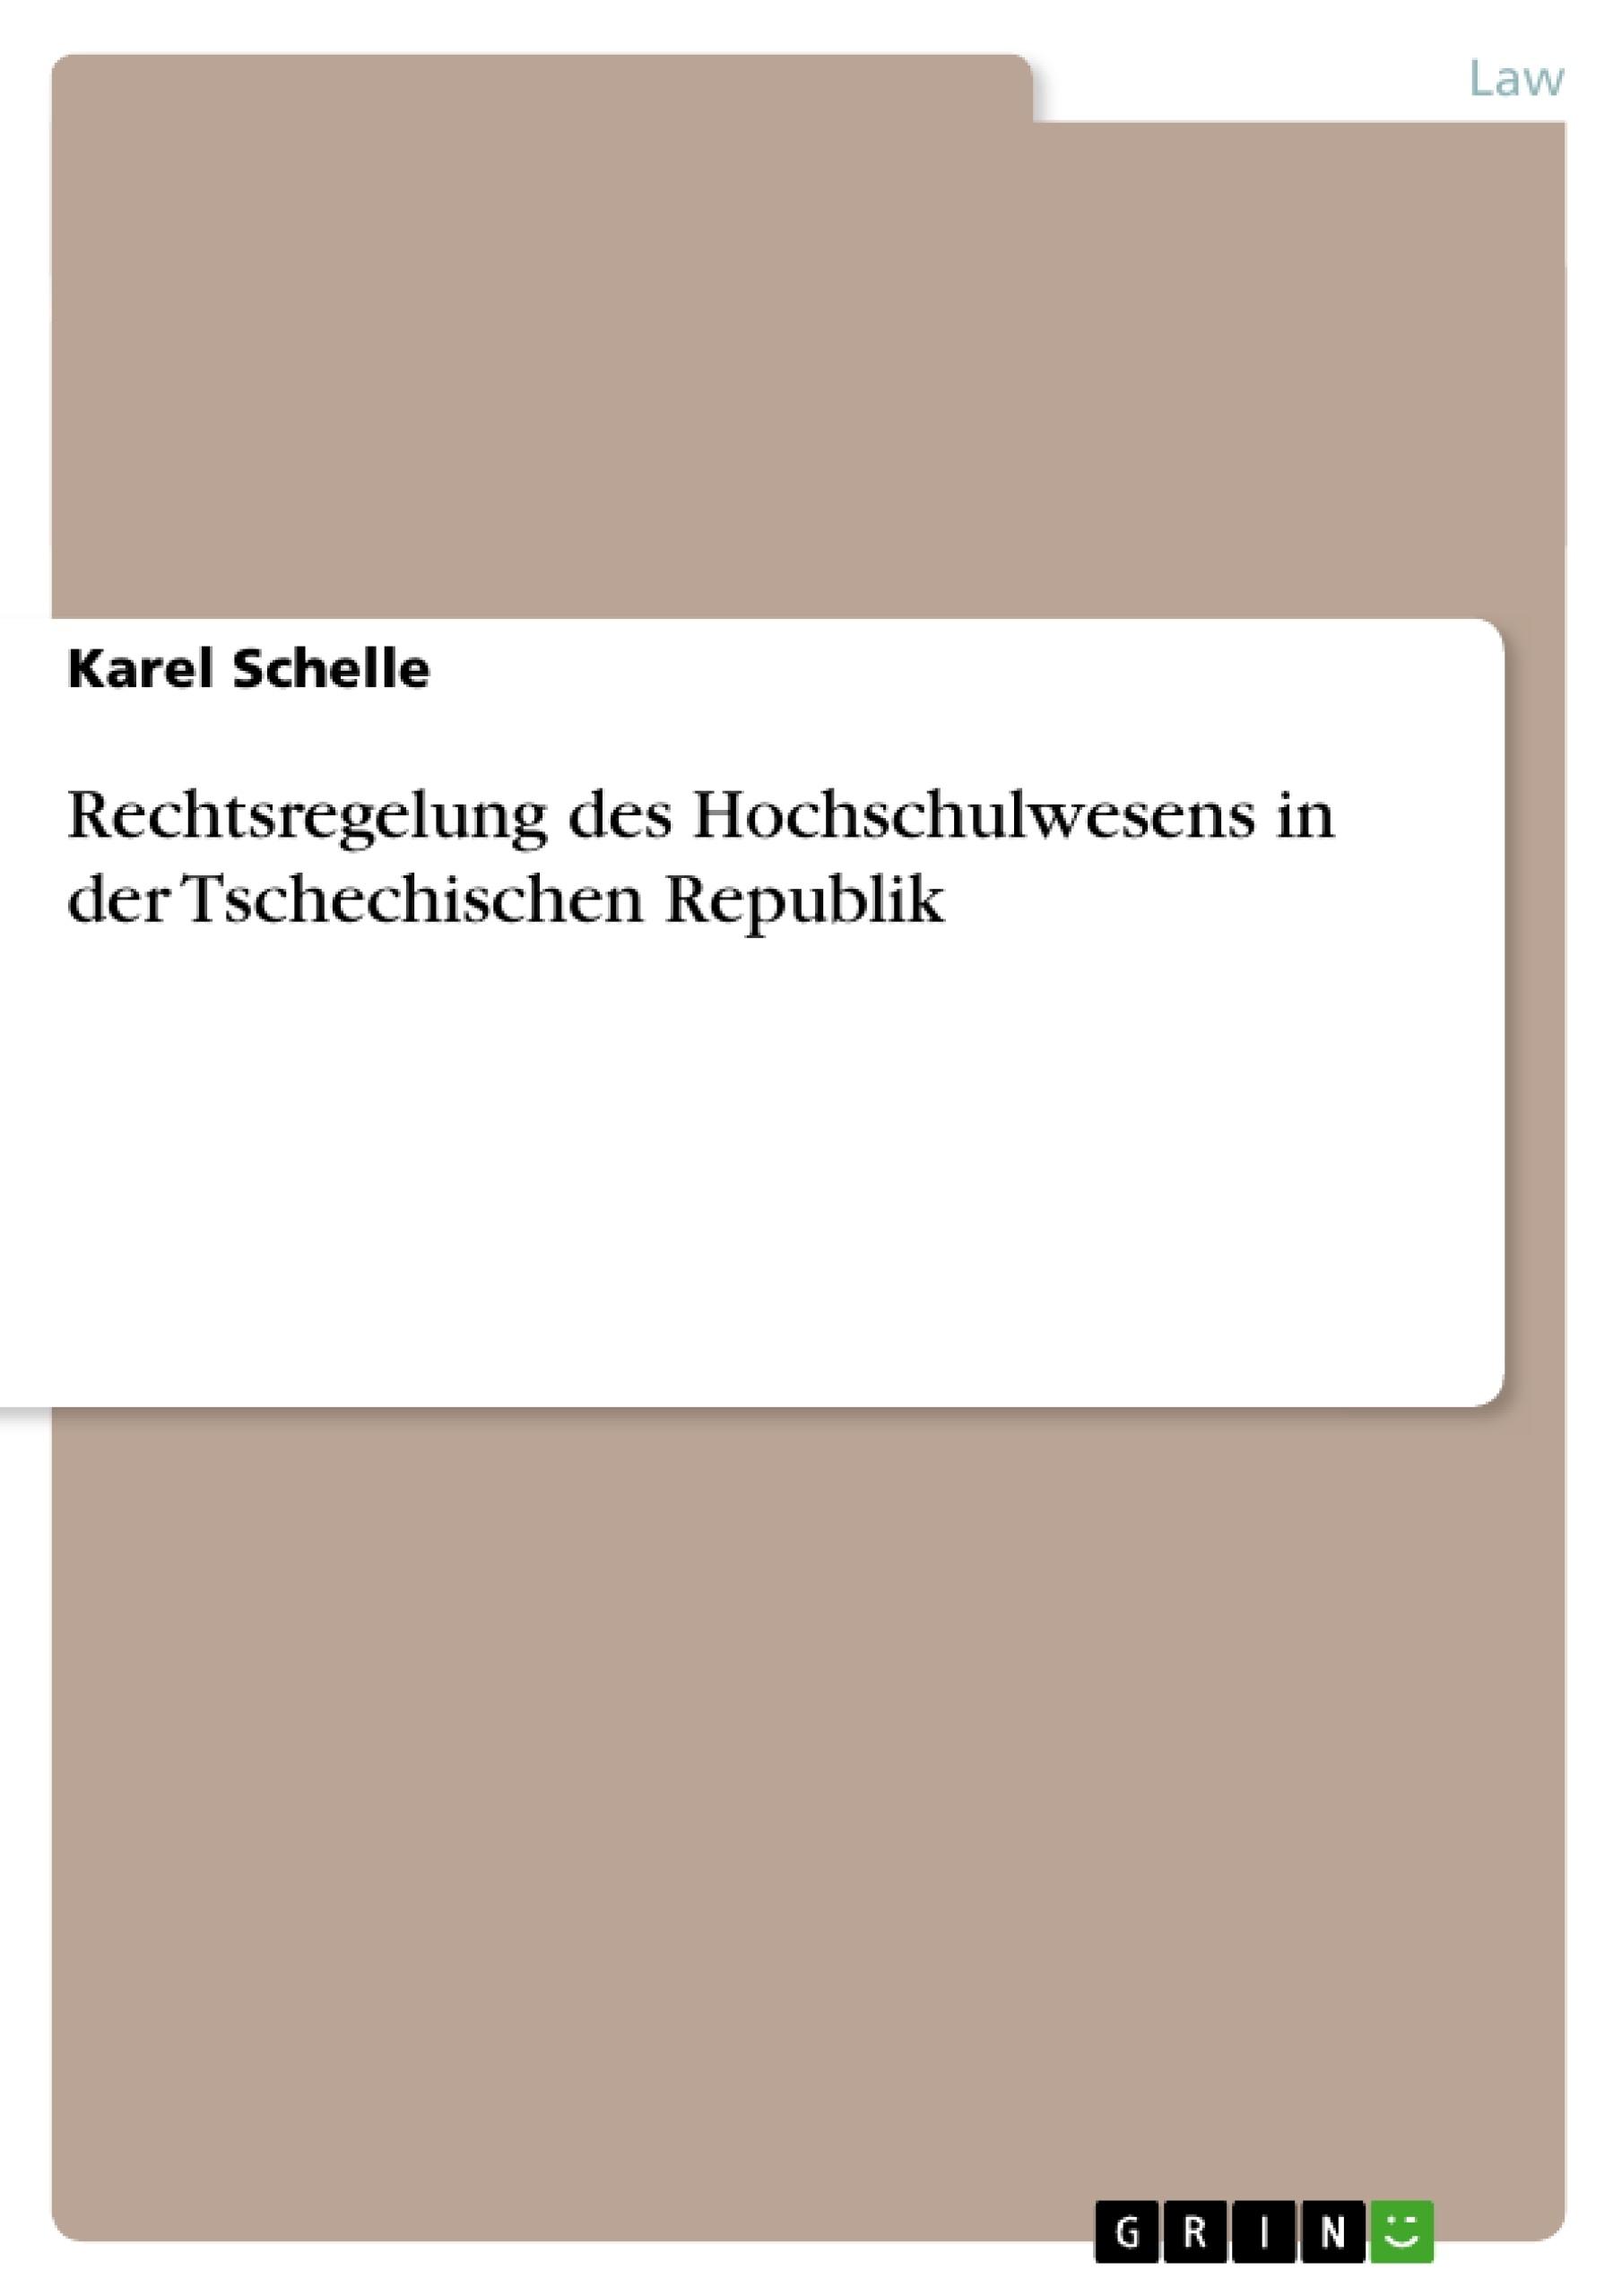 Title: Rechtsregelung des Hochschulwesens in der Tschechischen Republik